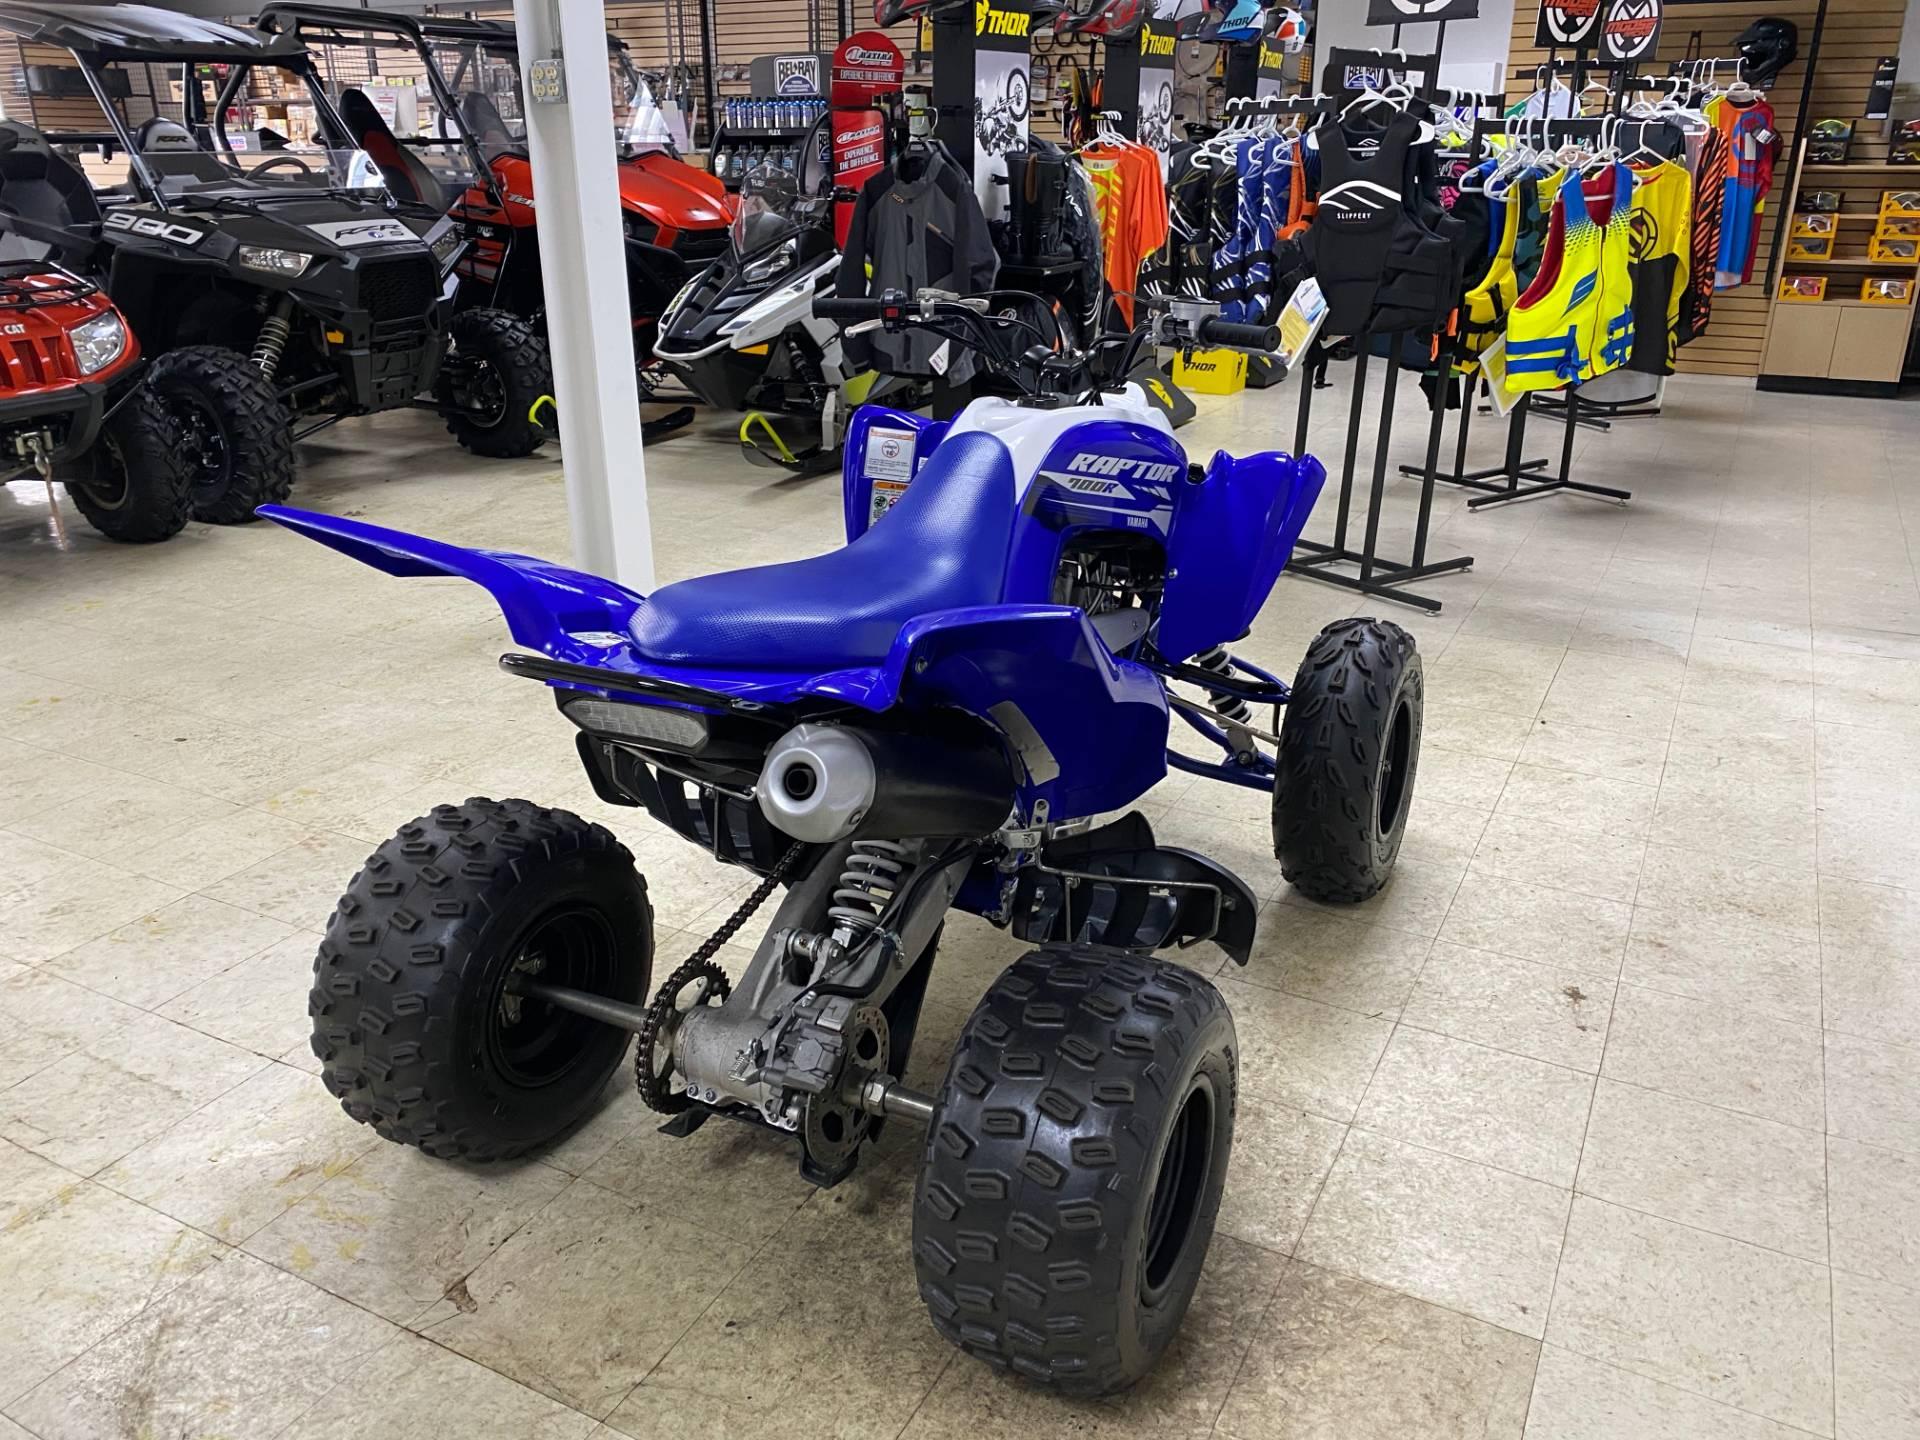 2018 Yamaha Raptor 700R 11